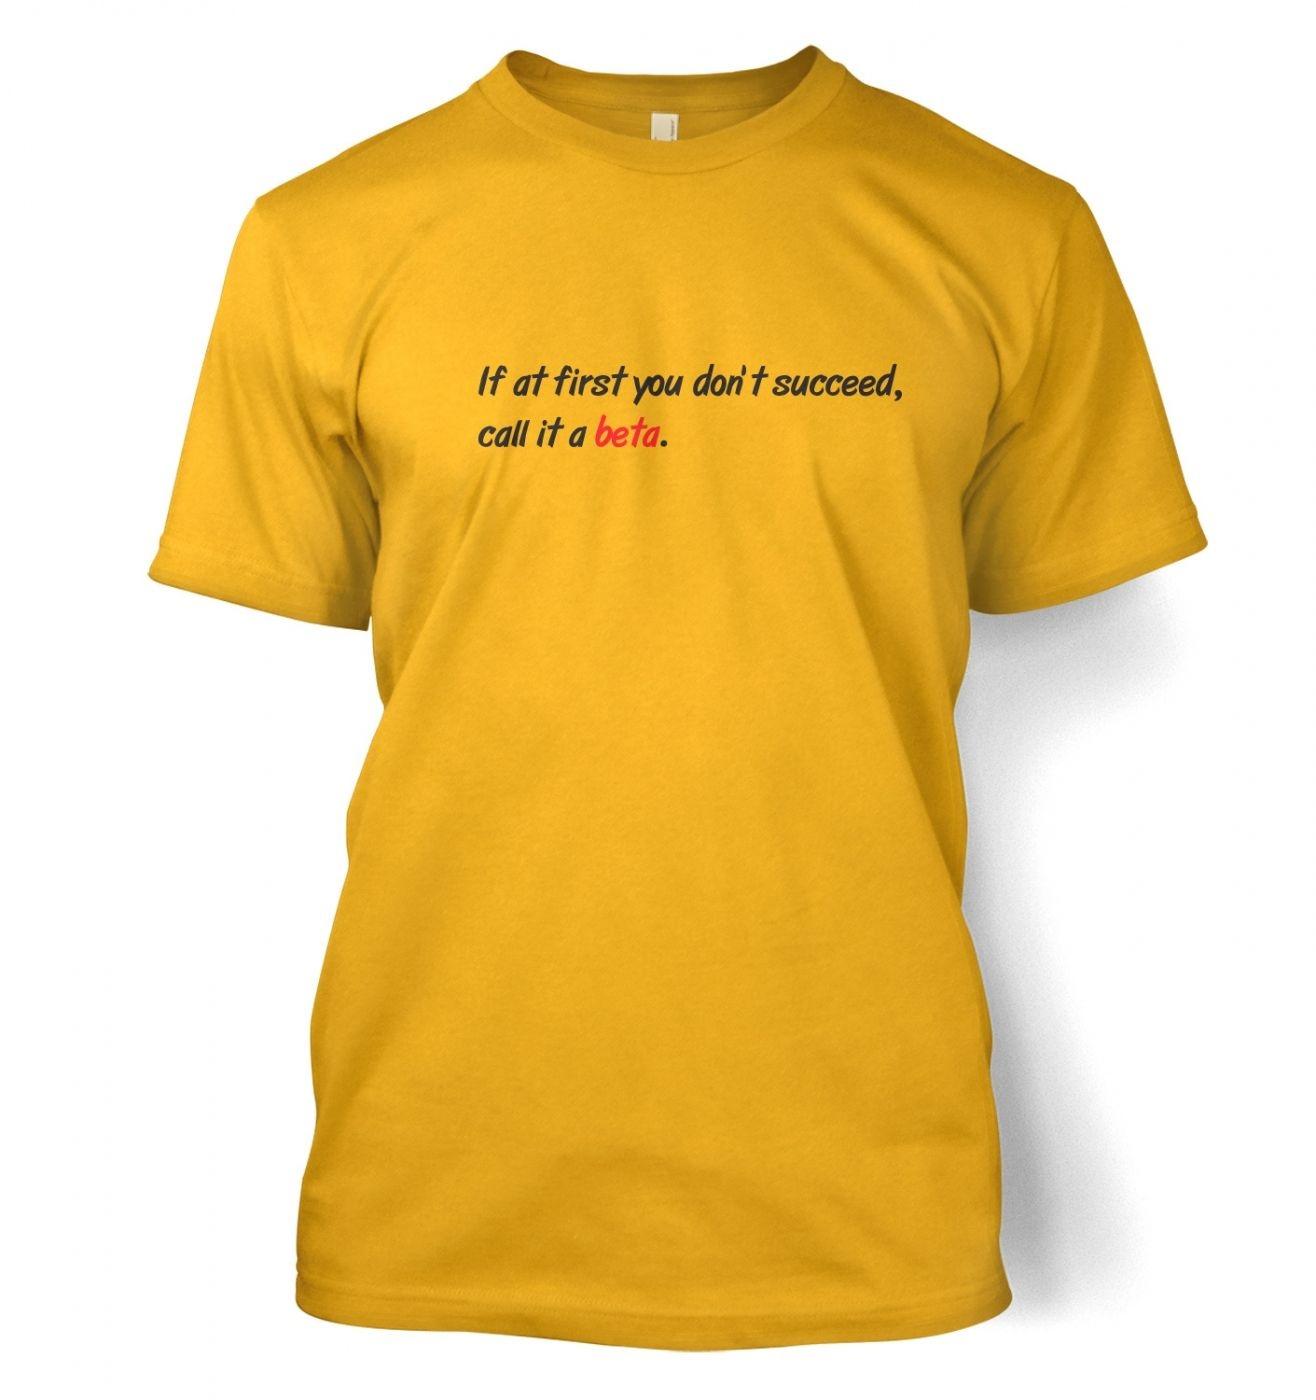 Call It A Beta men's t-shirt